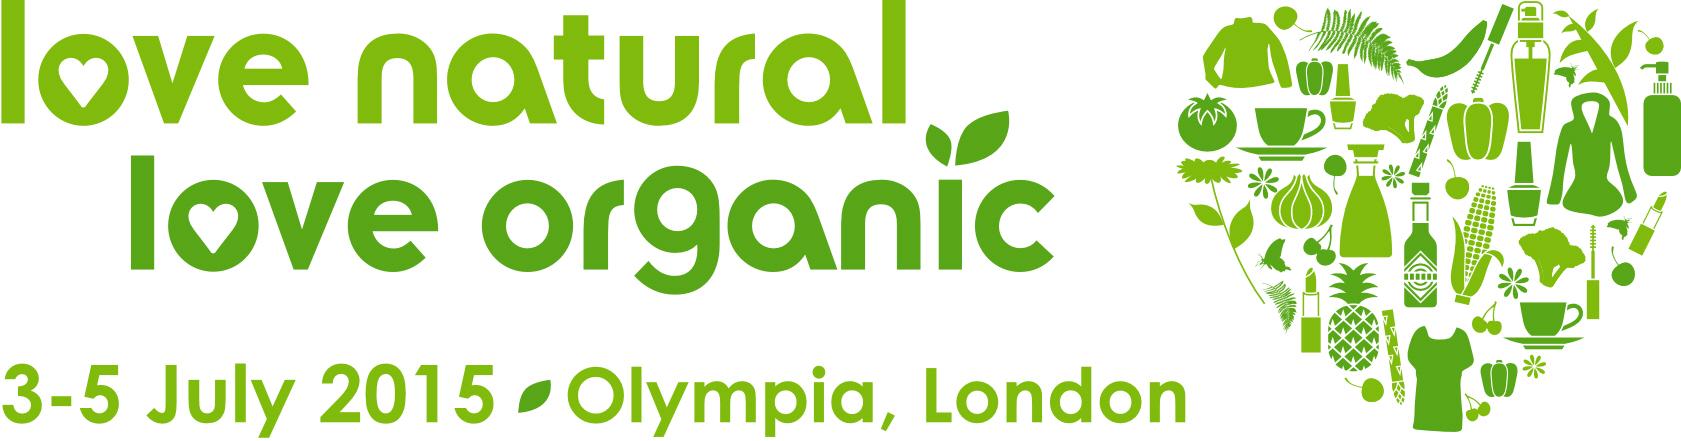 Love Natural Love Organic logo